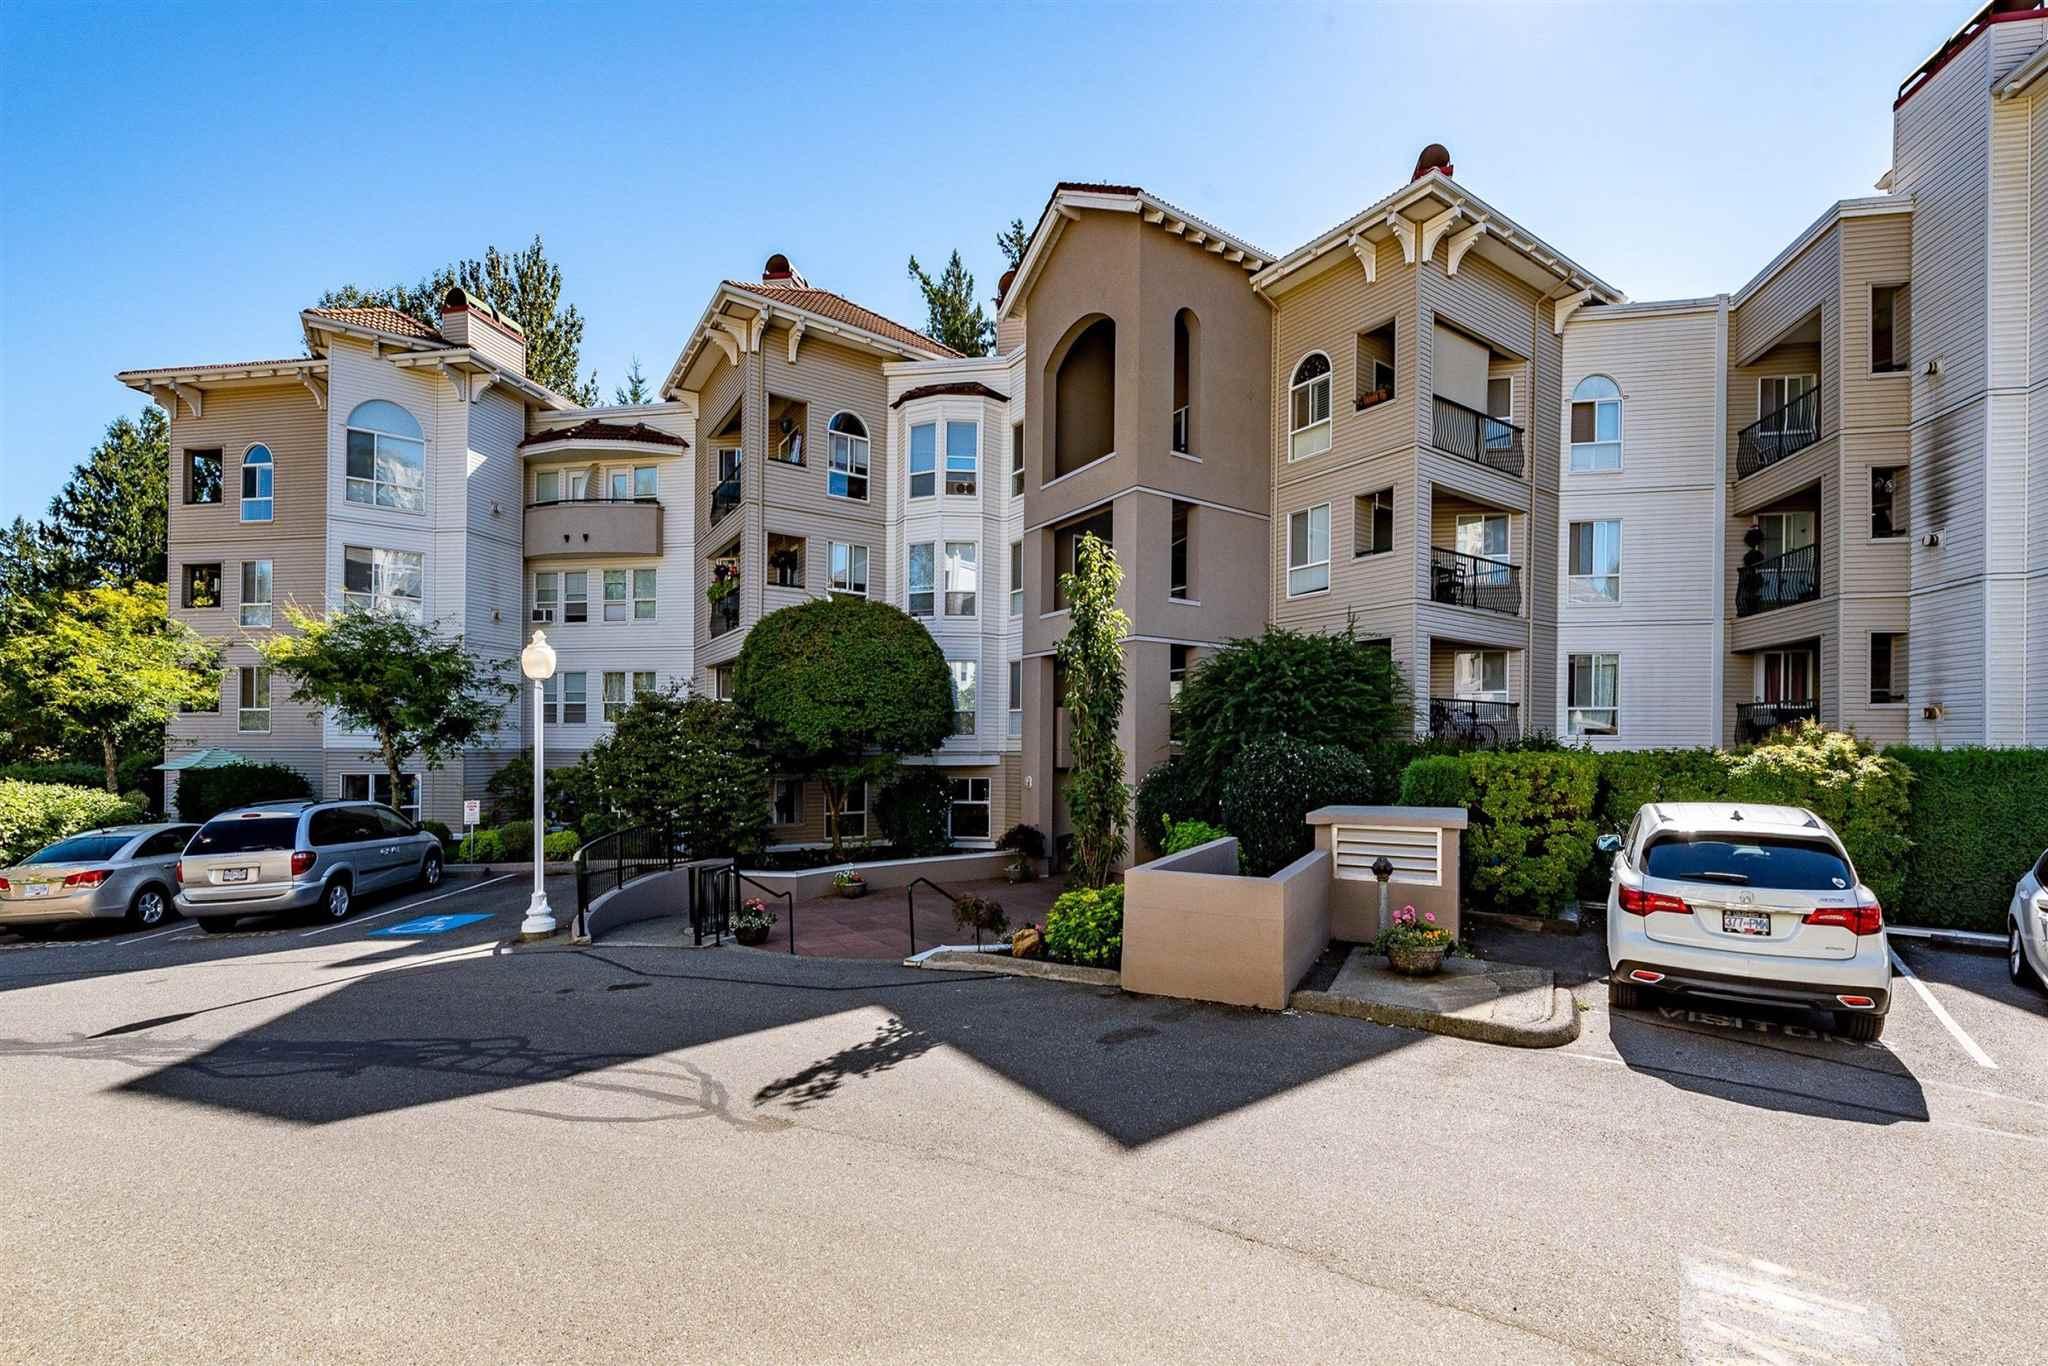 412 3176 GLADWIN ROAD - Central Abbotsford Apartment/Condo for sale, 2 Bedrooms (R2603924) - #1